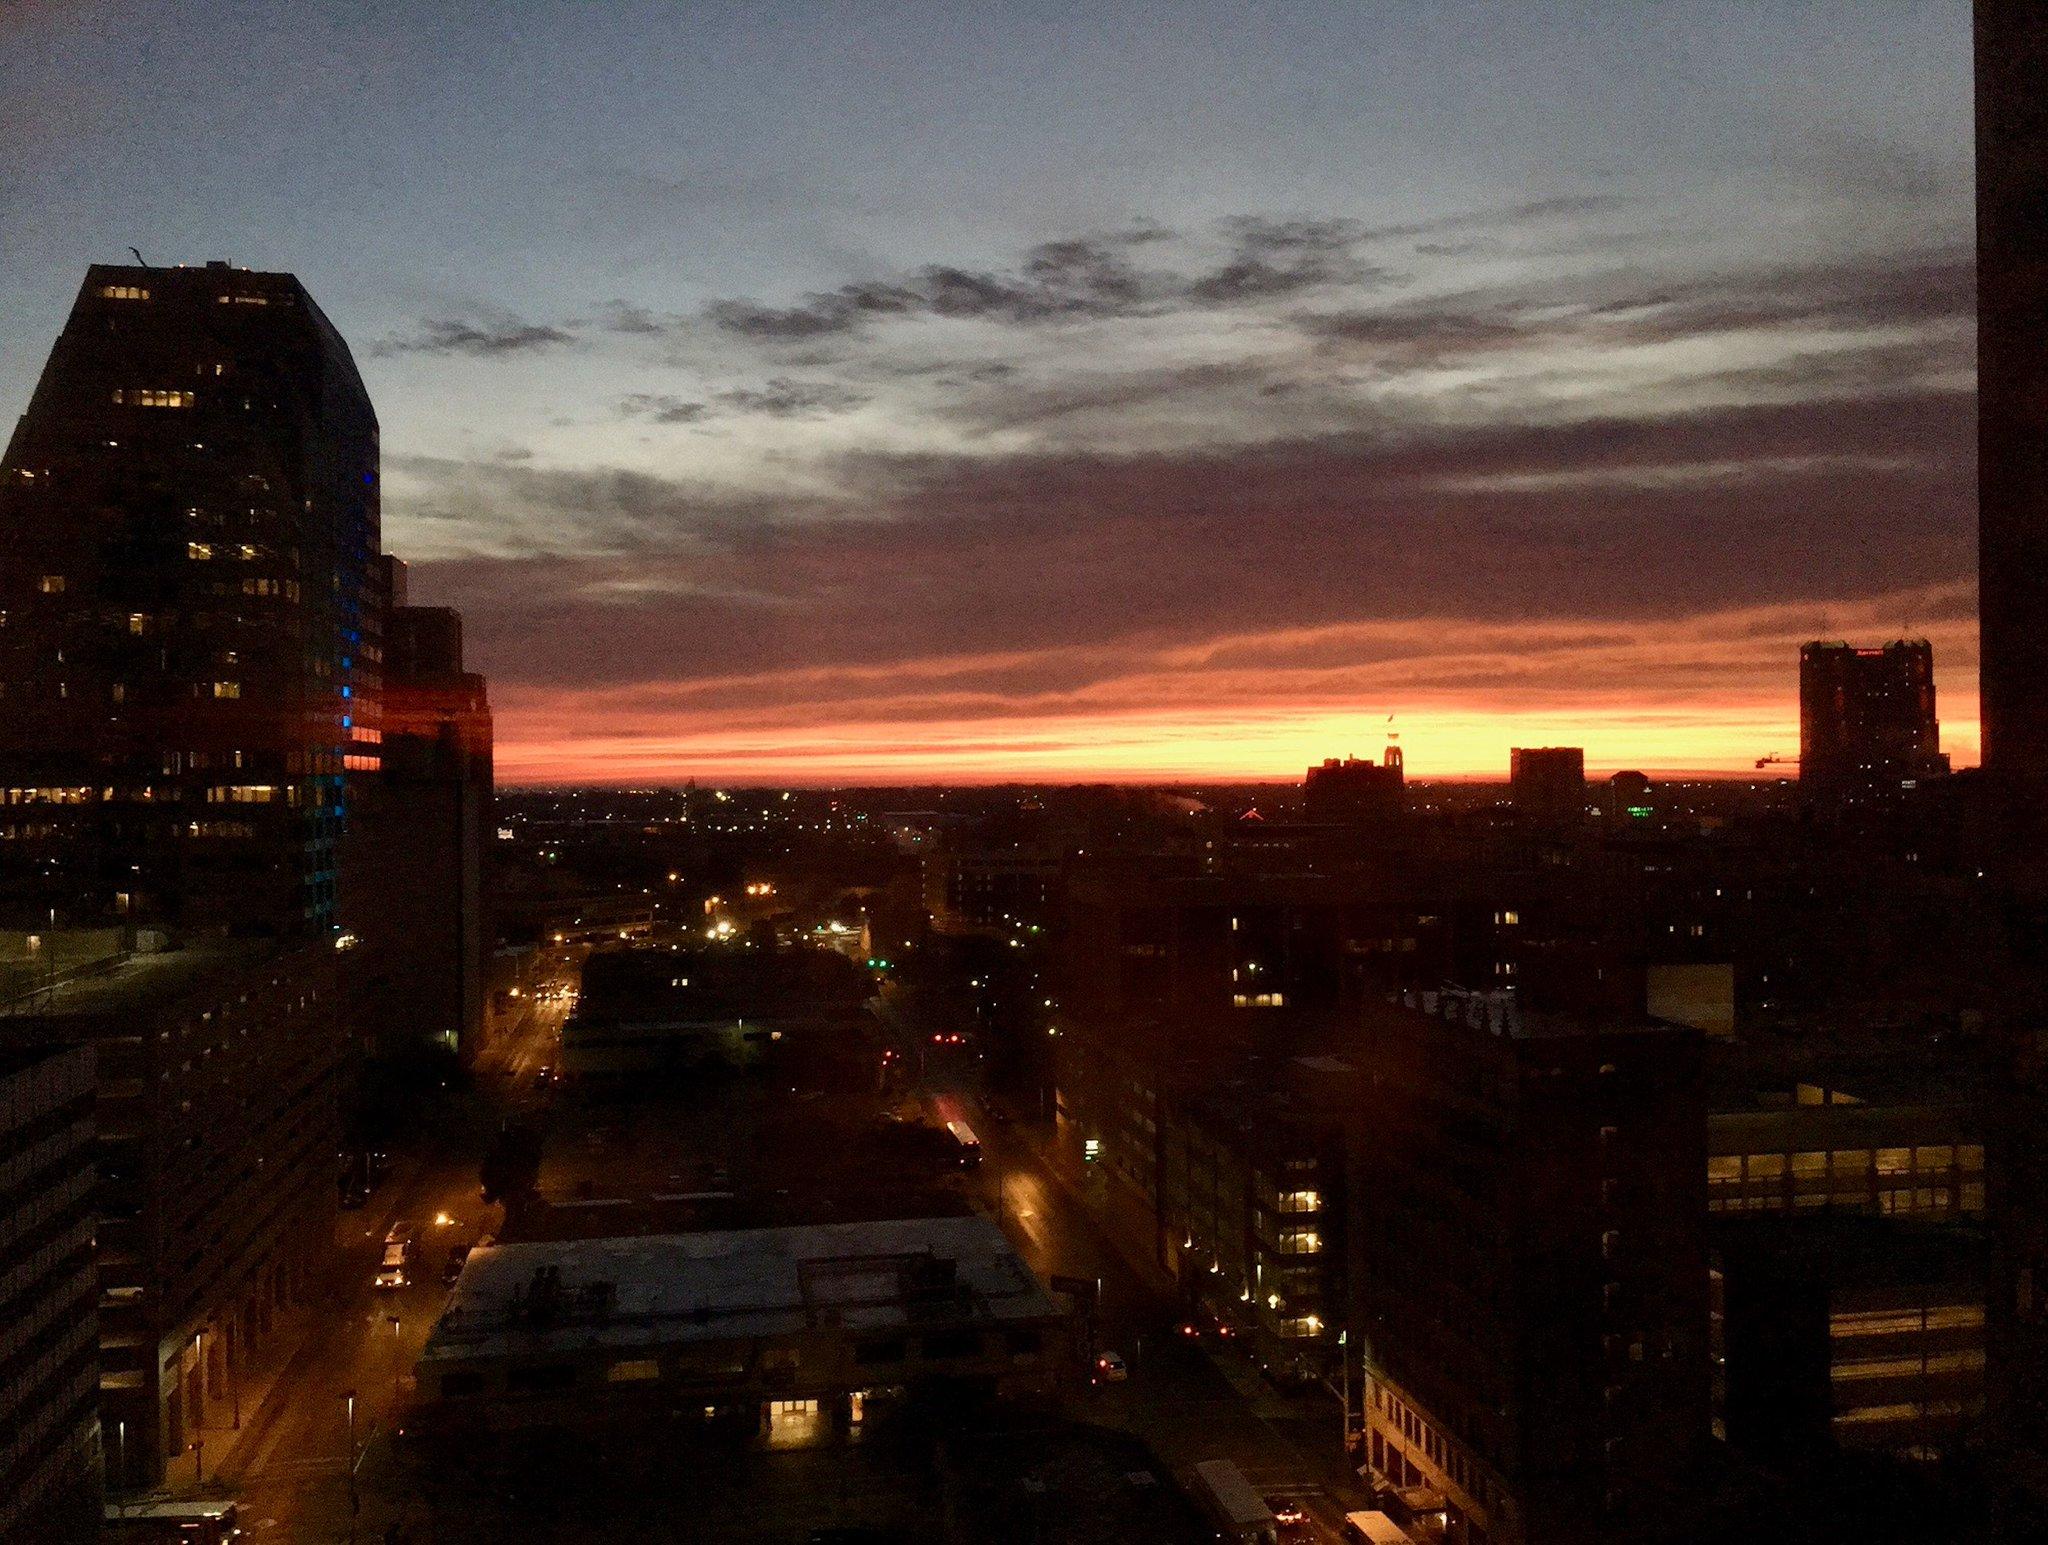 Sunrise over San Antonio. Good morning @LSCtweets  #LSCTIG Hackathon https://t.co/Vijak7VdFB